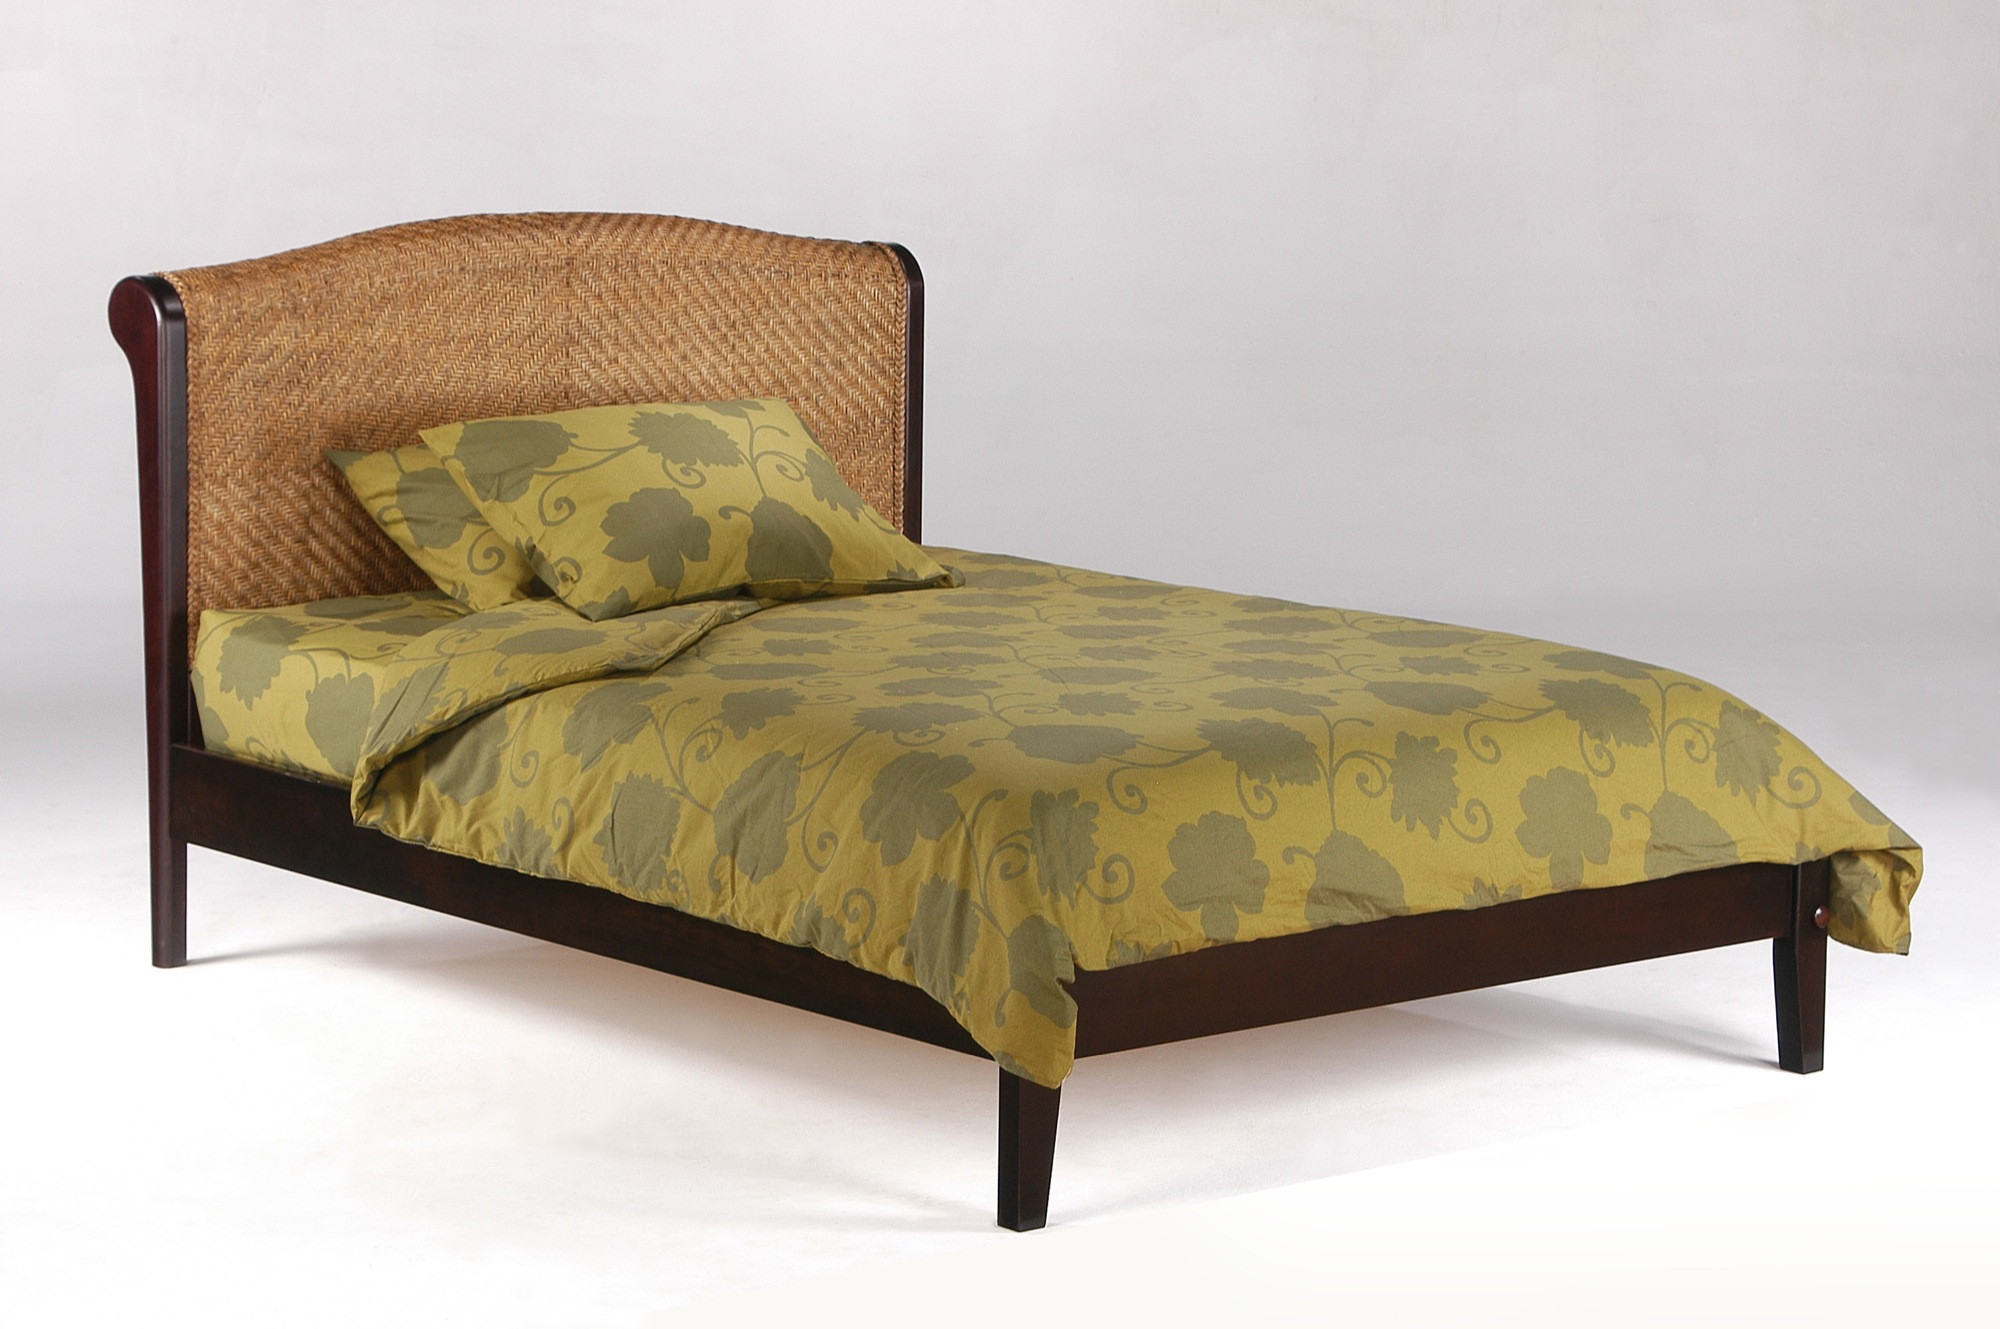 home today overstock garden dhp store product futons emily austin free shipping futon velvet